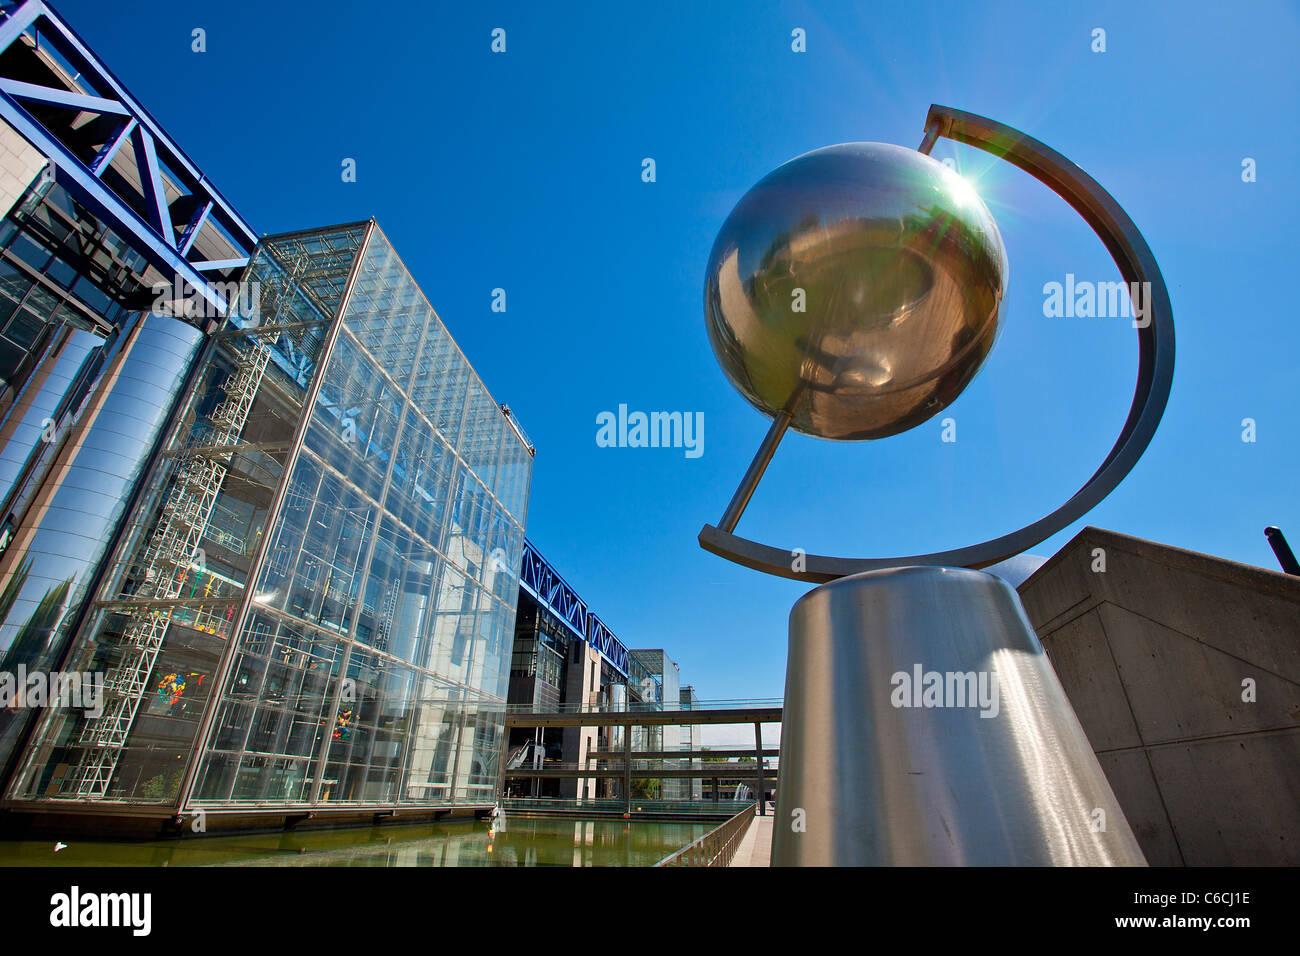 France, Paris, the city of Sciences and Industry in La Villette Park - Stock Image